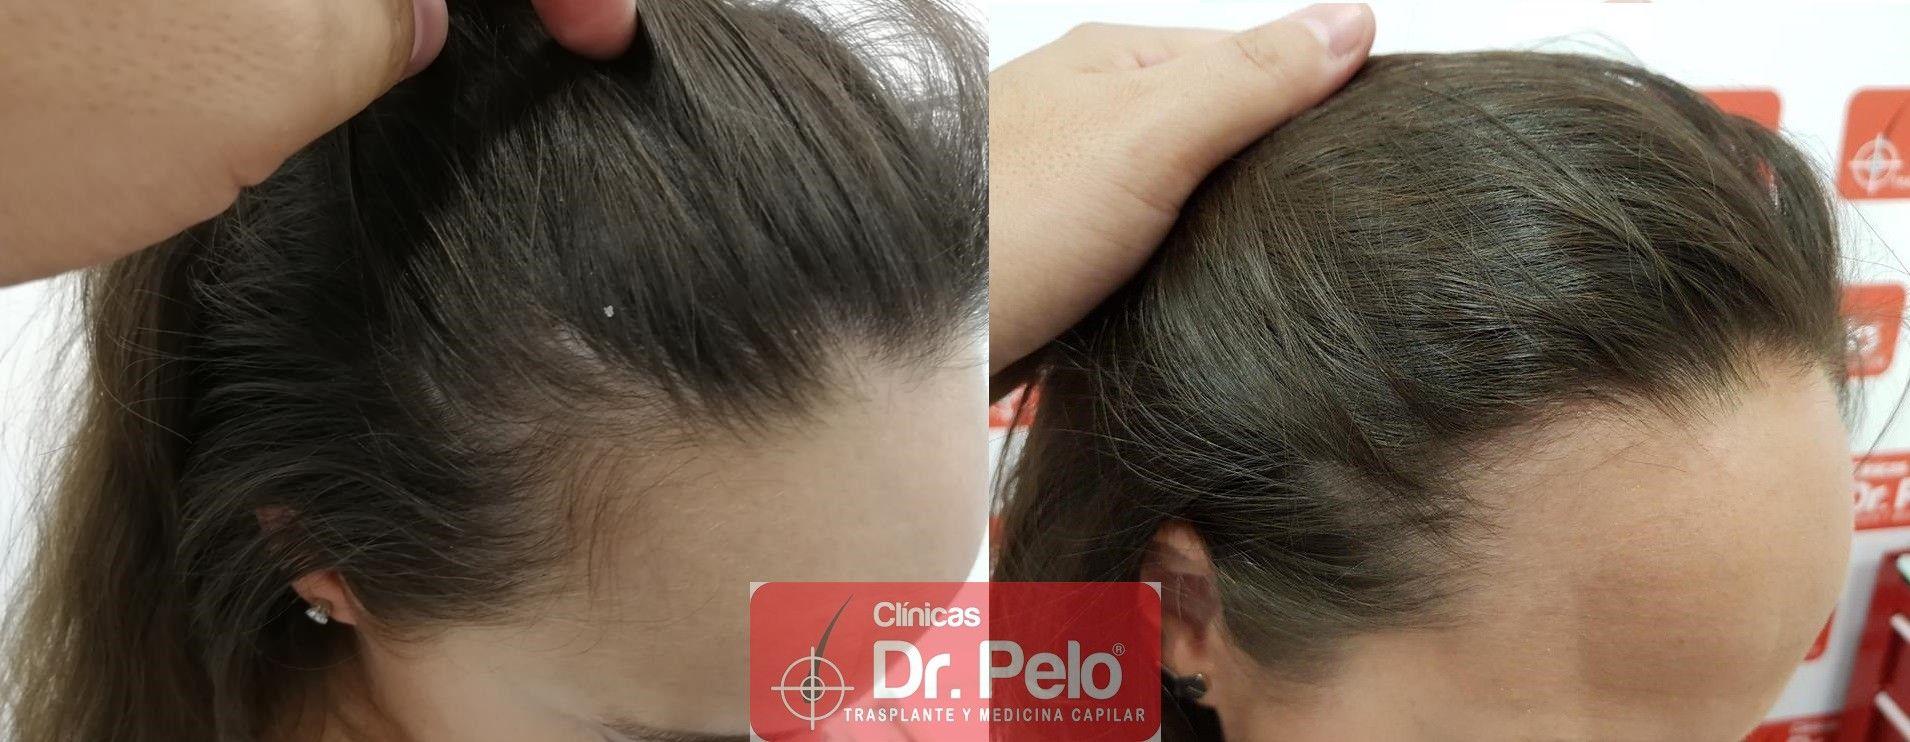 [Imagen: tratamiento-capilar-mesoterapia-dr-pelo-12-1.jpg]